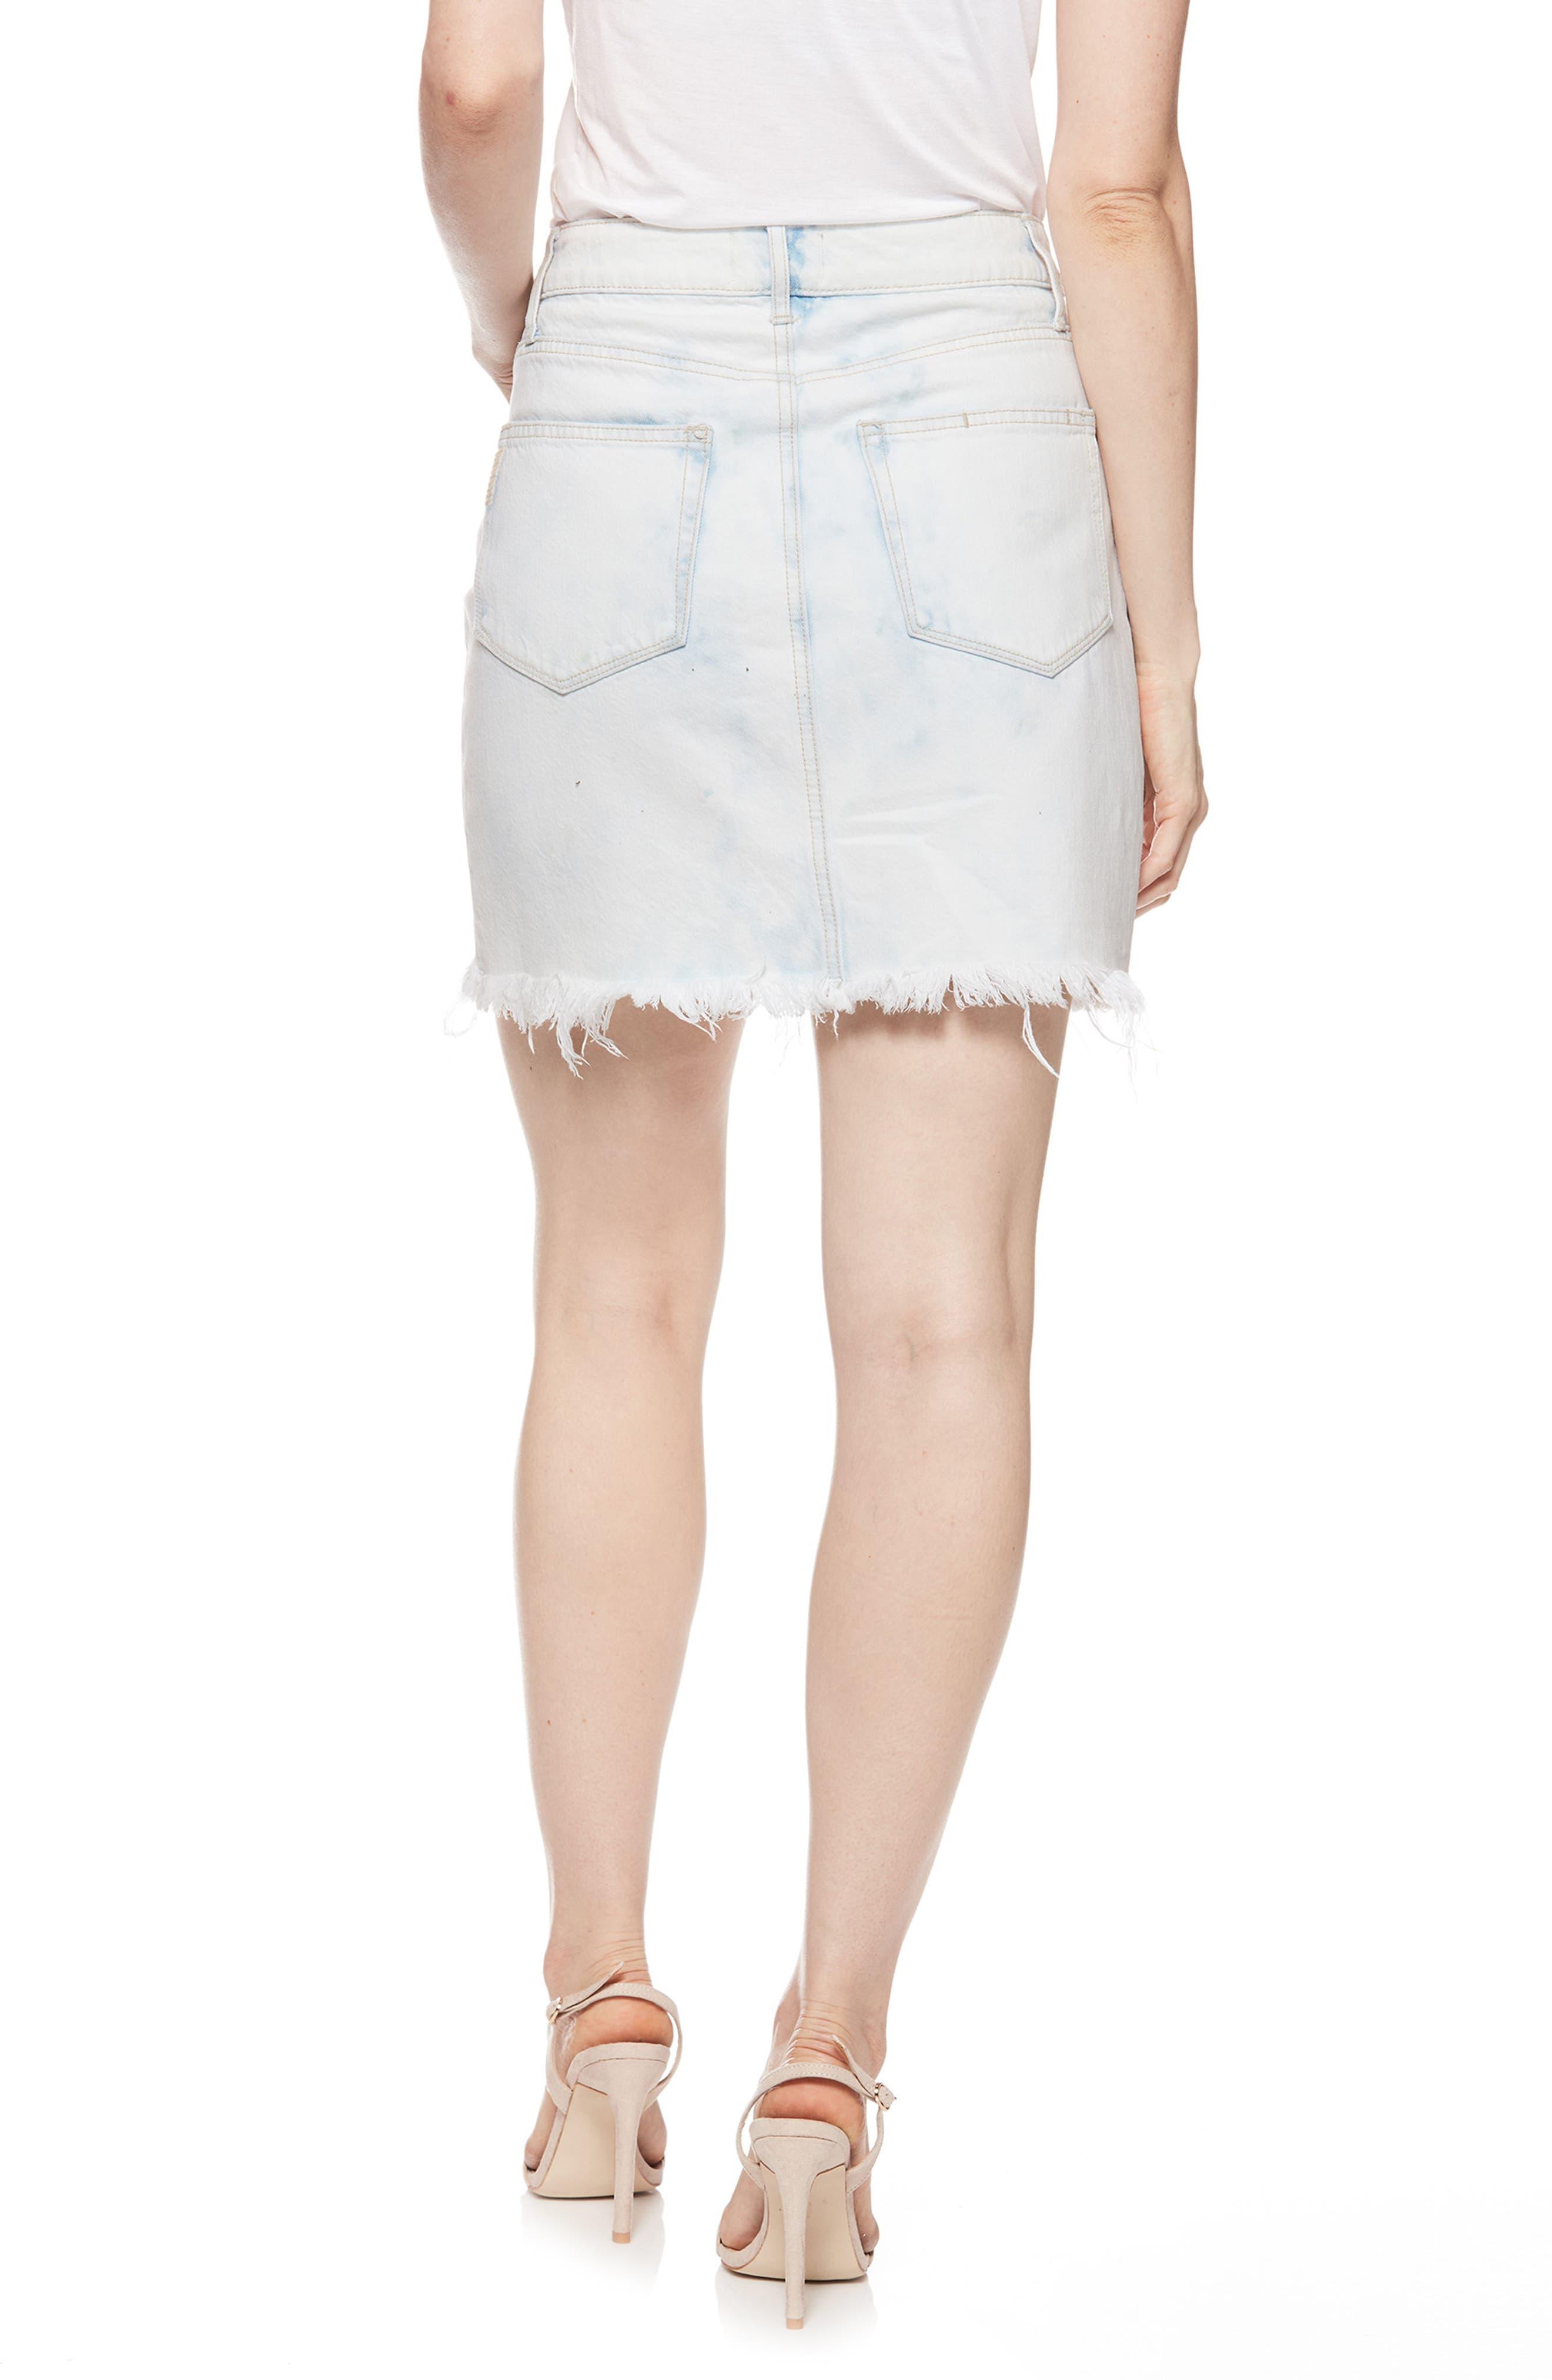 PAIGE,                             Jamine High Waist Denim Skirt,                             Alternate thumbnail 2, color,                             400